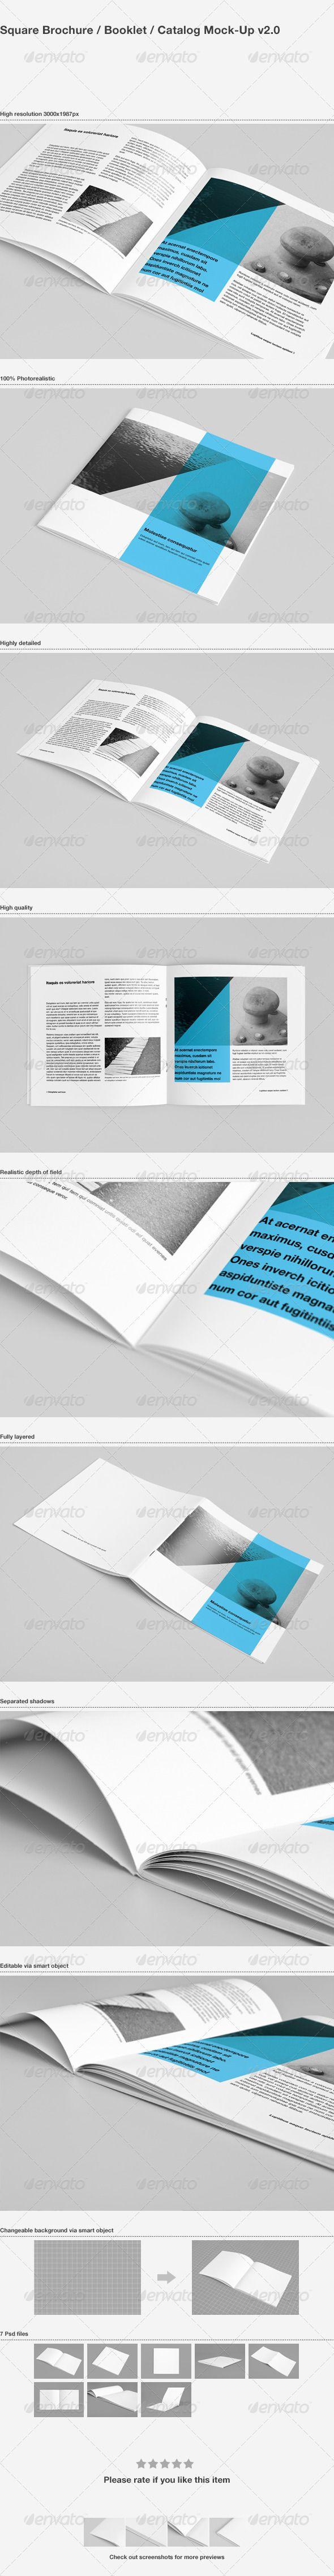 Square Brochure / Booklet / Catalog Mock-Up #brochuremockup #bookletmockup #catalogmockup Download: http://graphicriver.net/item/square-brochure-booklet-catalog-mockup/3019036?ref=ksioks